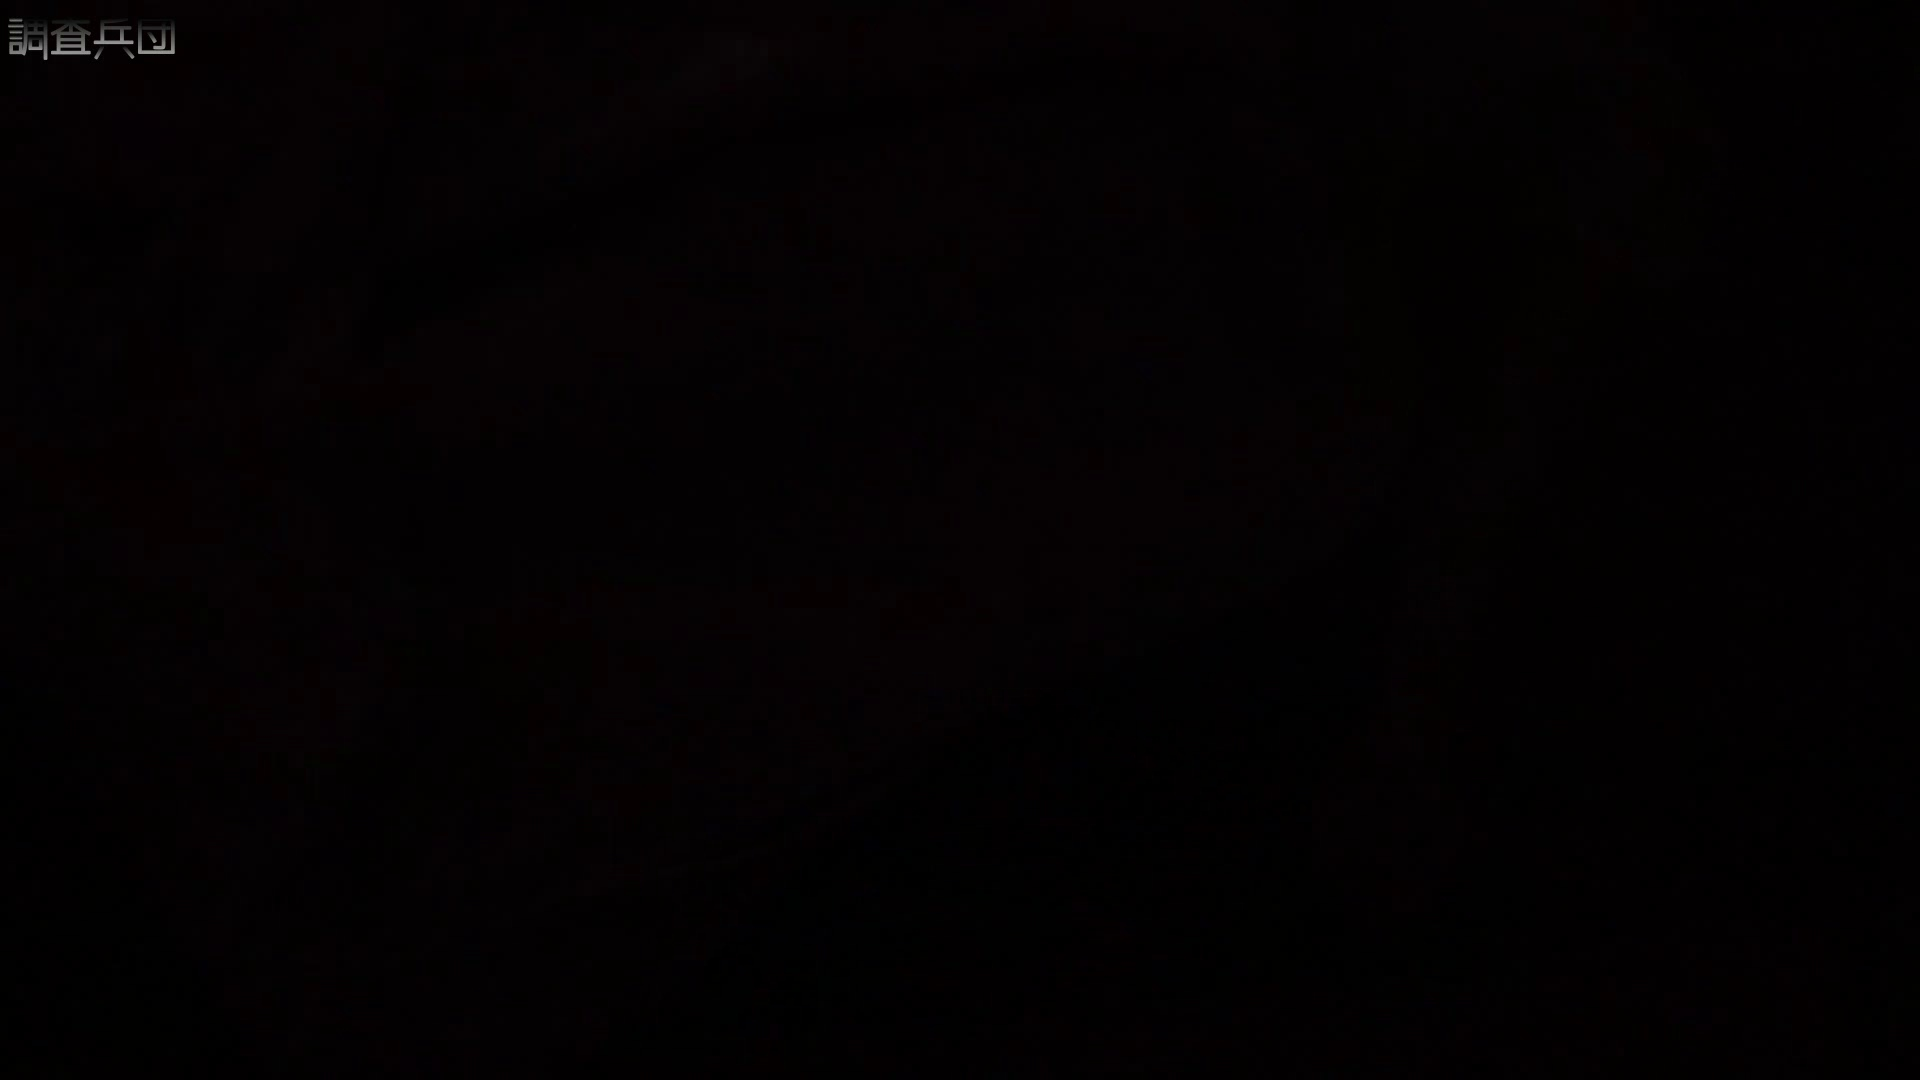 RE:~反撃の悪戯~vol.24 危険で淫靡な香りのする・まりりん【後編】 お姉さん攻略 スケベ動画紹介 98画像 27